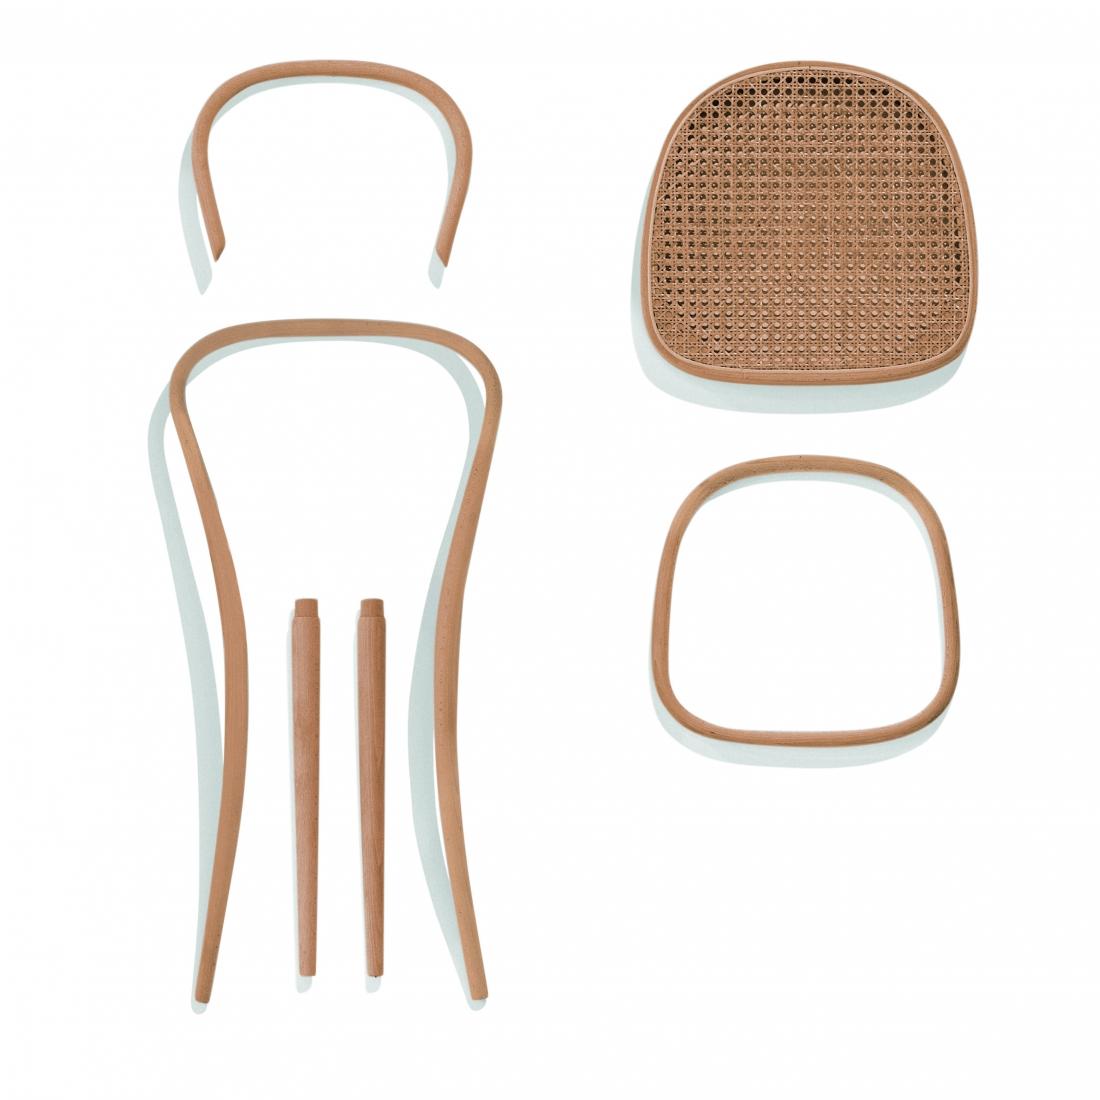 Tnonet 214 Chair